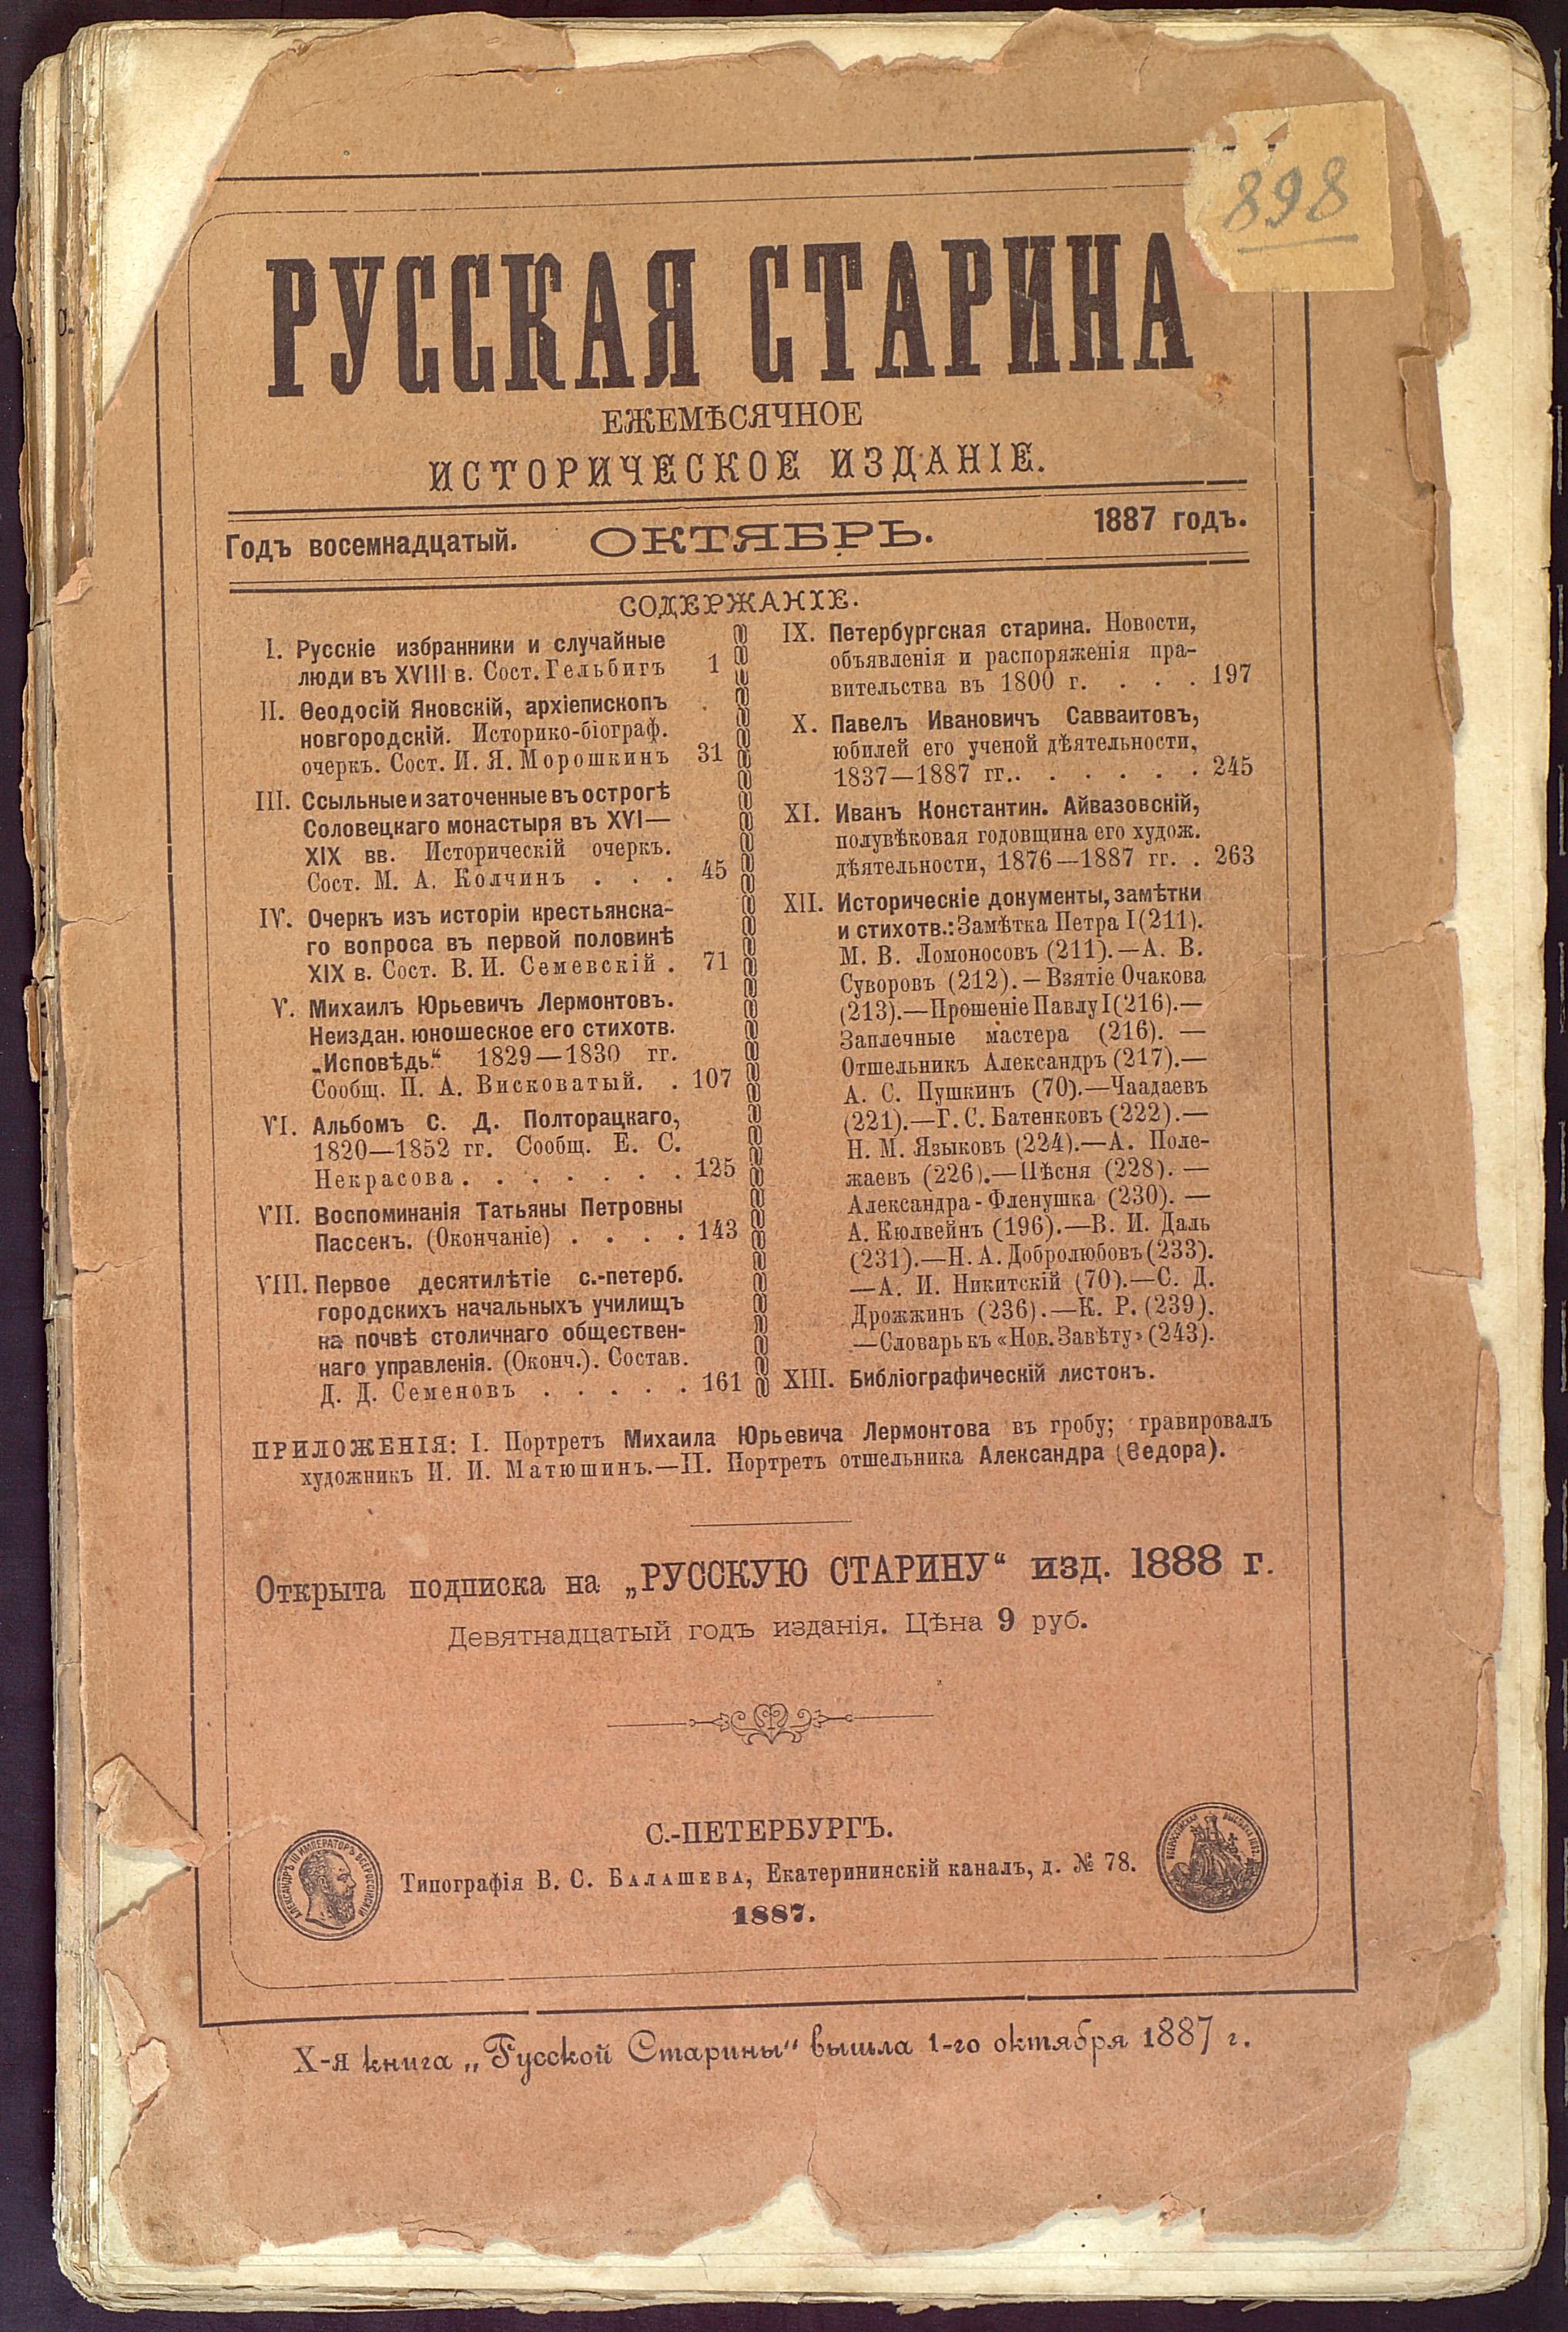 ЛОК-5687 ТАРХАНЫ КП-11936  Журнал Русская старина.  № 10._1